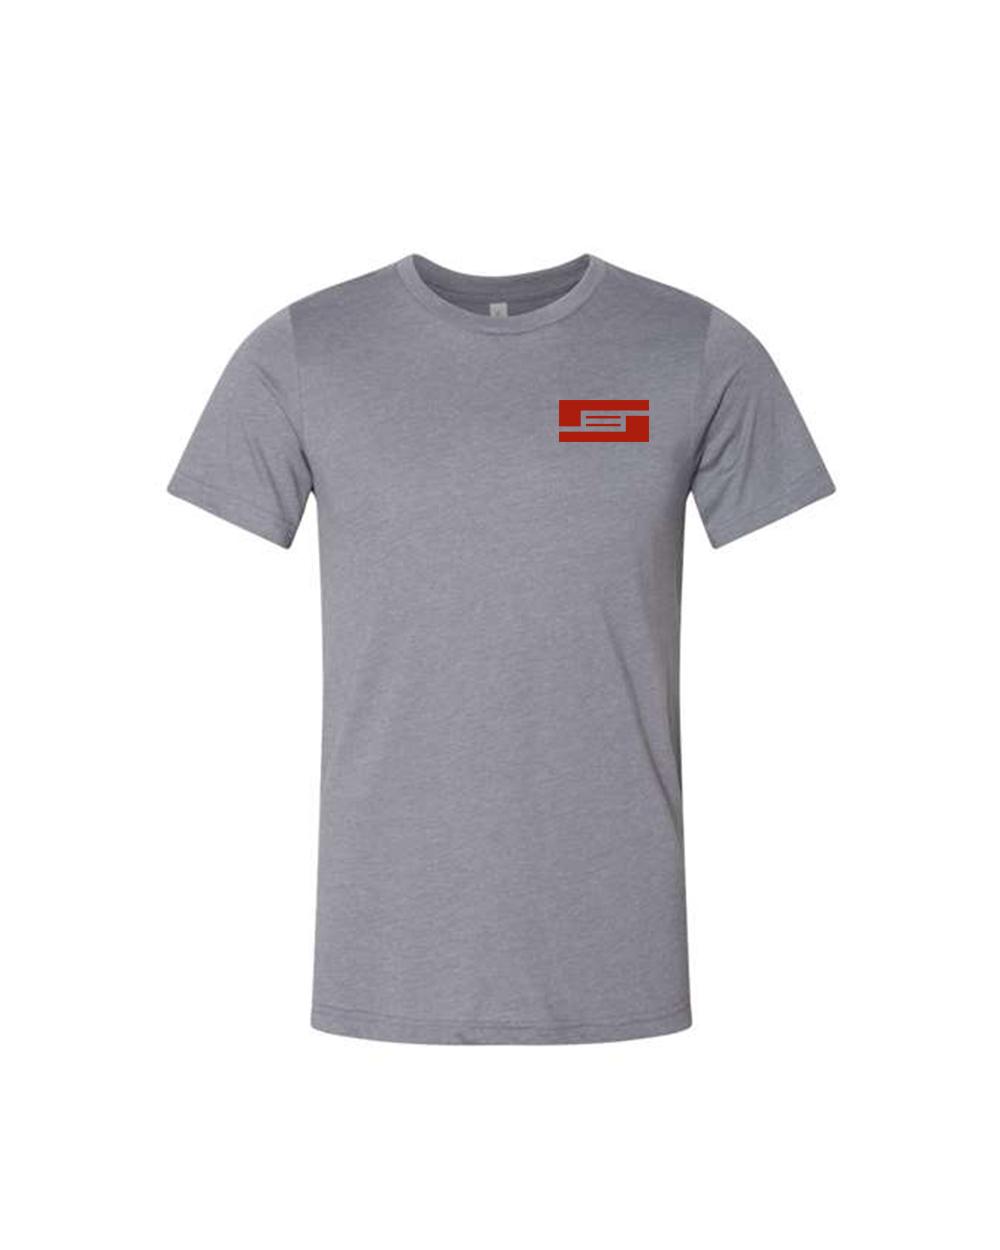 BYRD Pocket Logo Gray Shirt